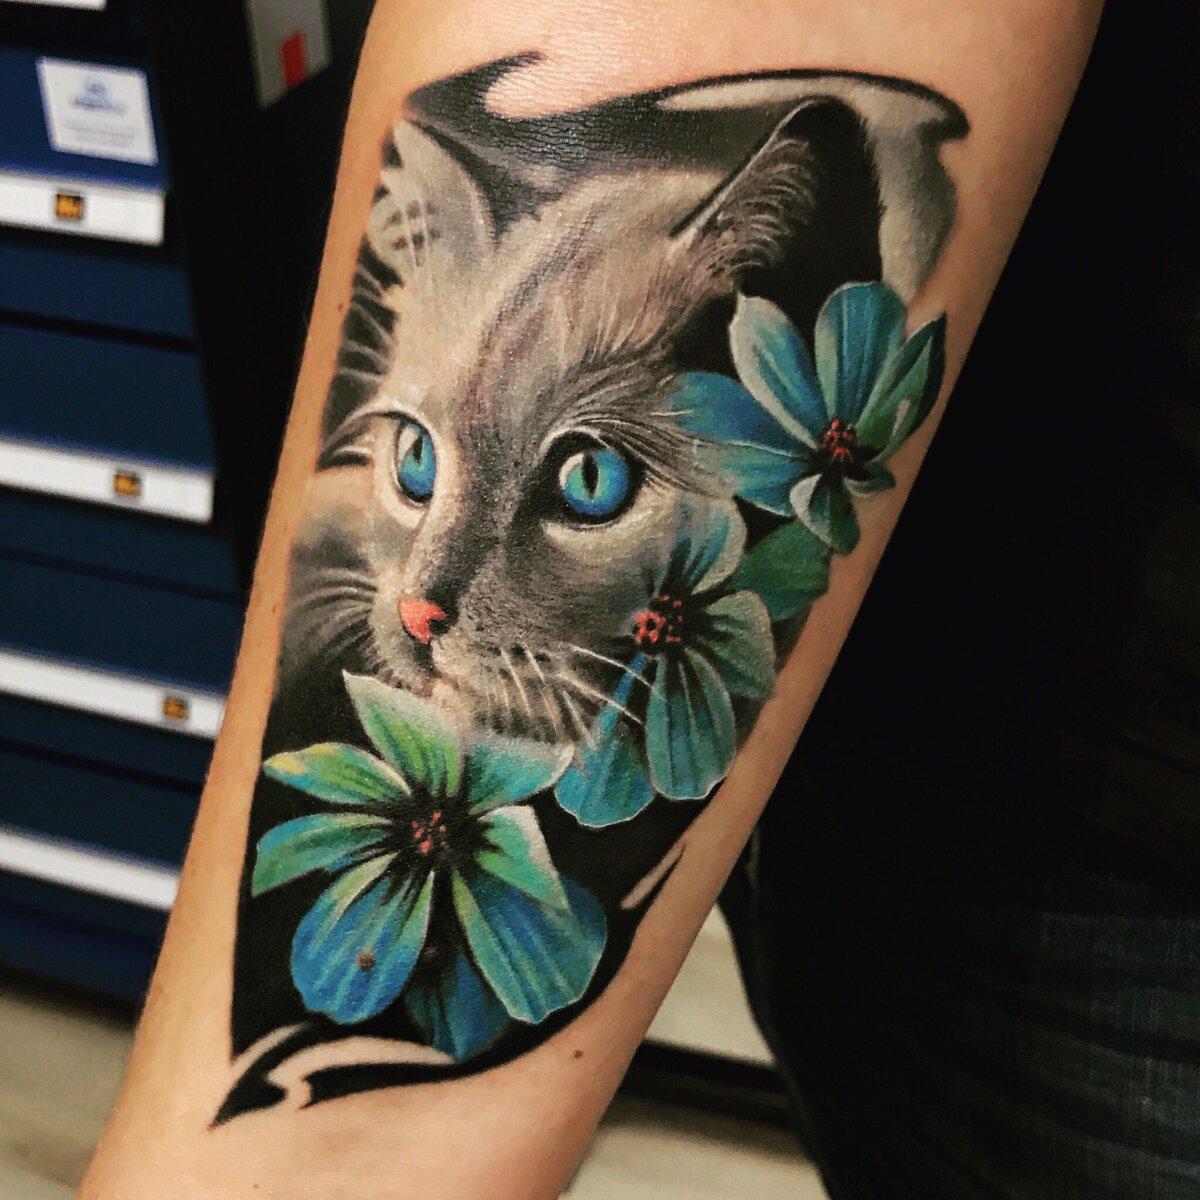 фото картинки кошек для тату является